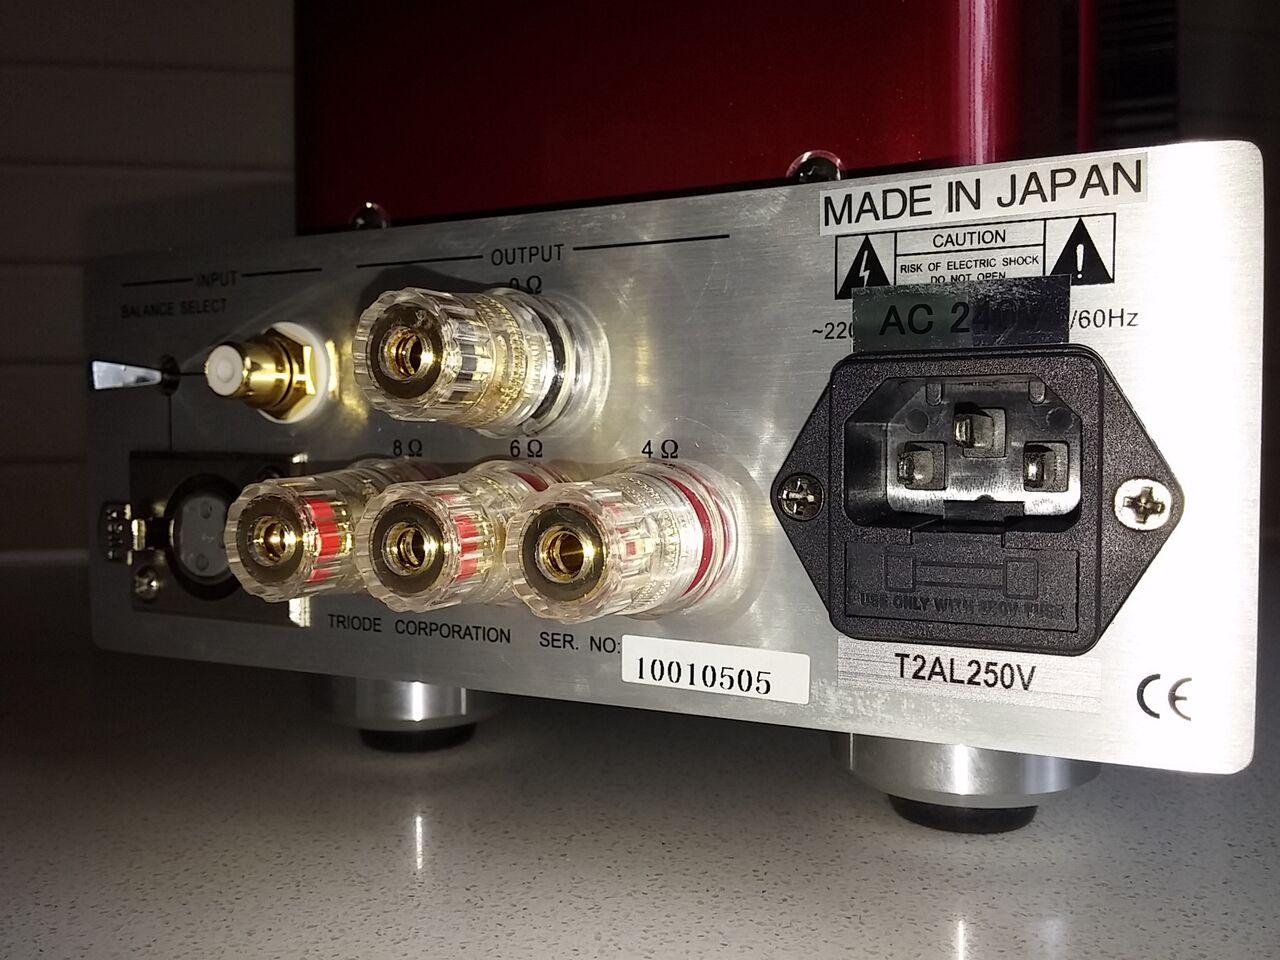 Reviewed: Triode TRV-M88SE Mono Valve Amplifiers